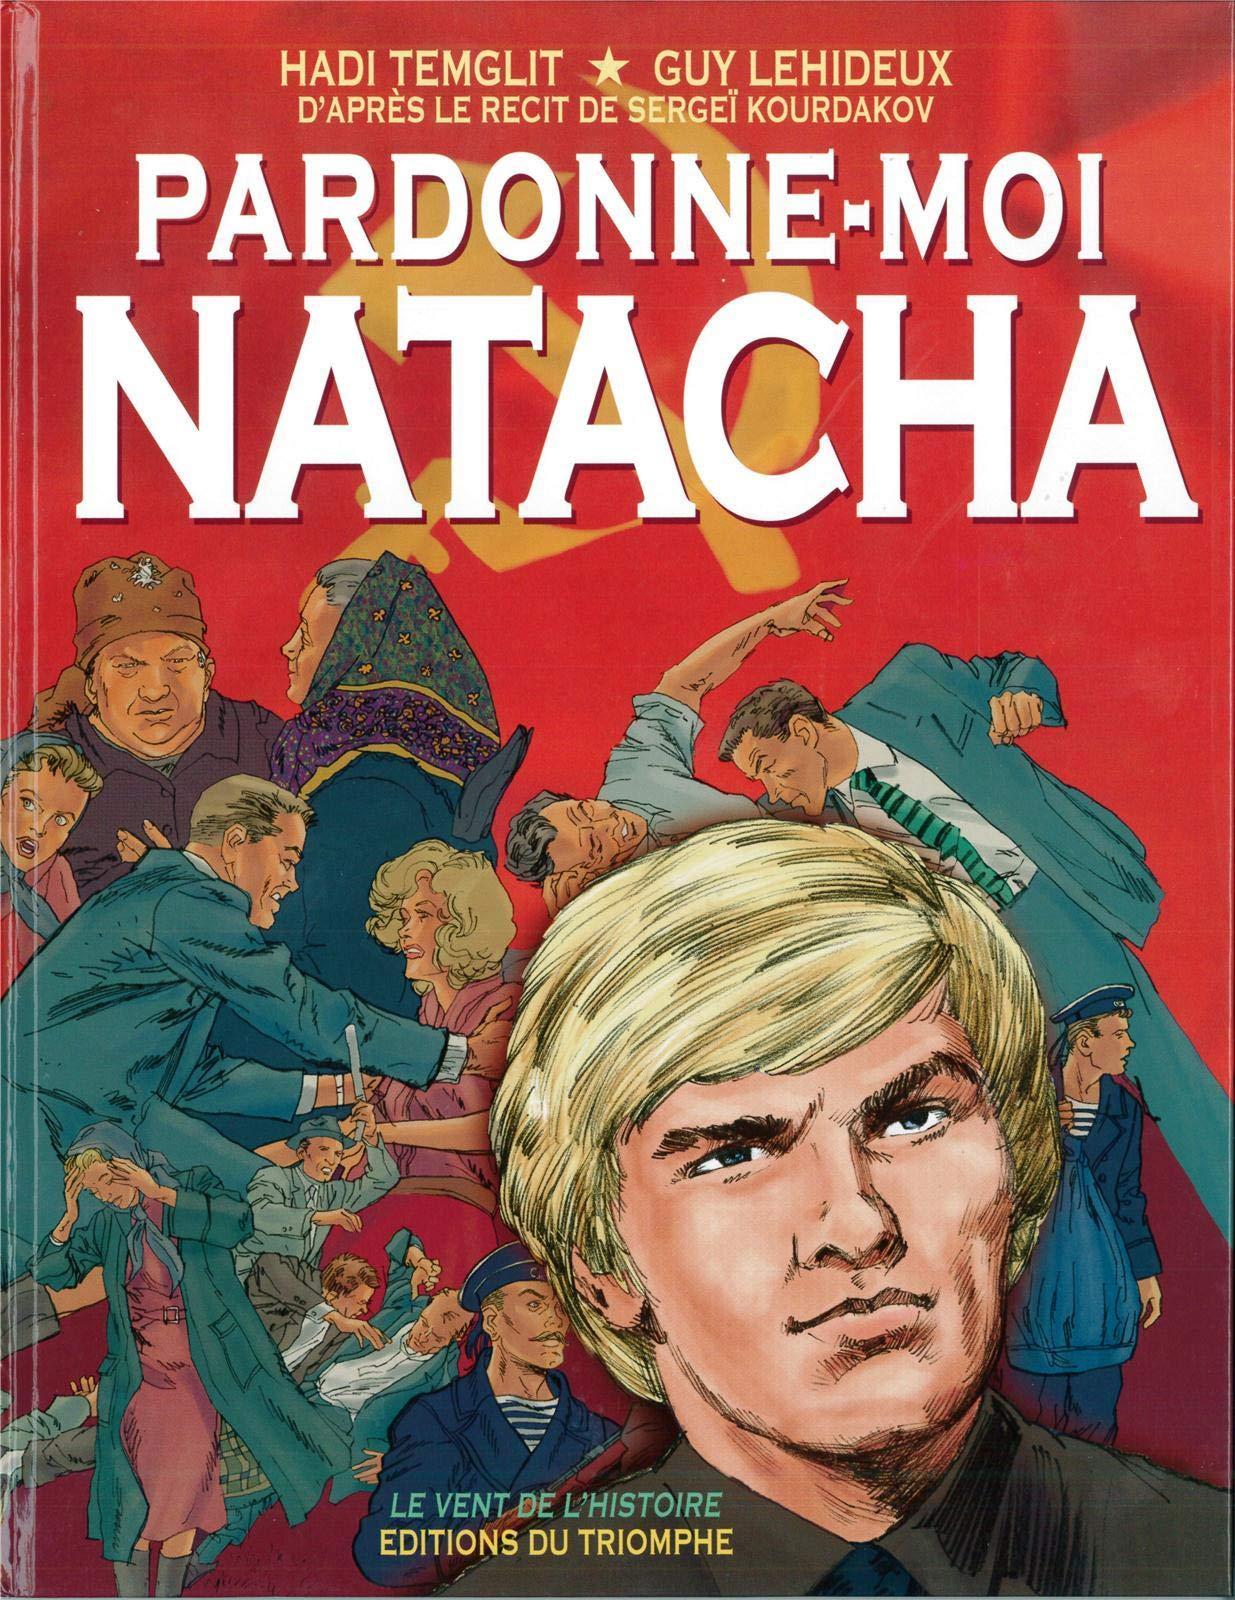 Amazon Fr Pardonne Moi Natacha Bande Dessinee Sergei Kourdakov Hadi Temglit Guy Lehideux Livres